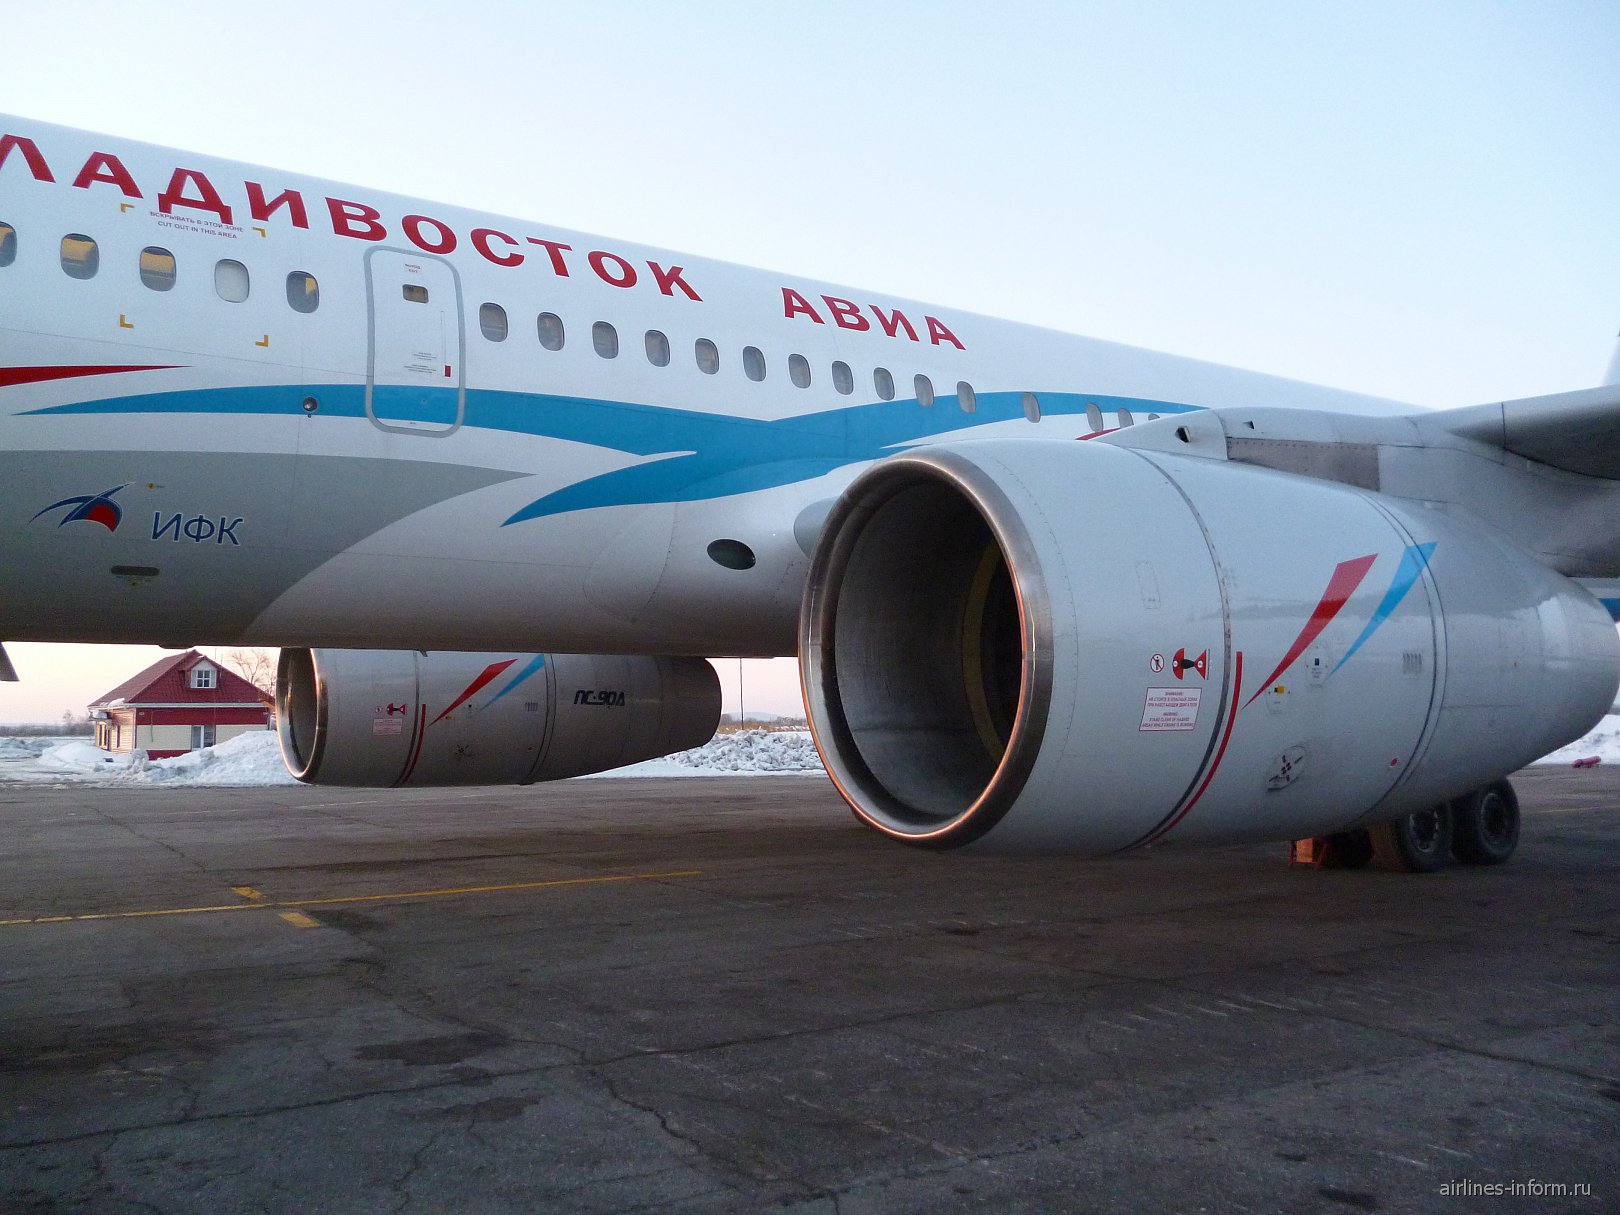 Хабаровск - Владивосток. Владивосток Авиа. На Ту 204-300